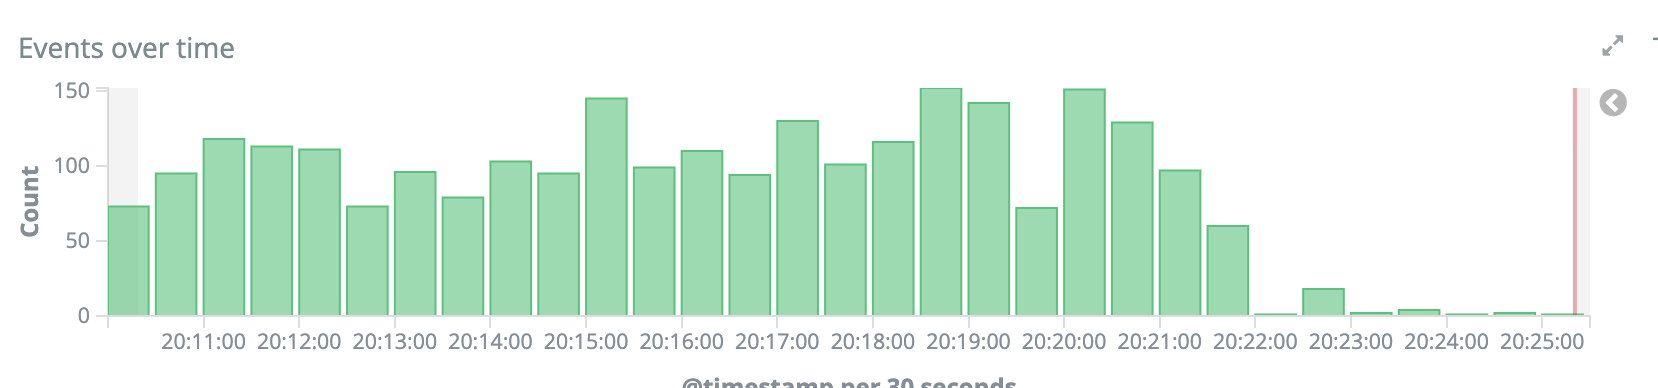 Screenshot 2020-02-14 at 13.25.32.png (388×1 px, 57 KB)